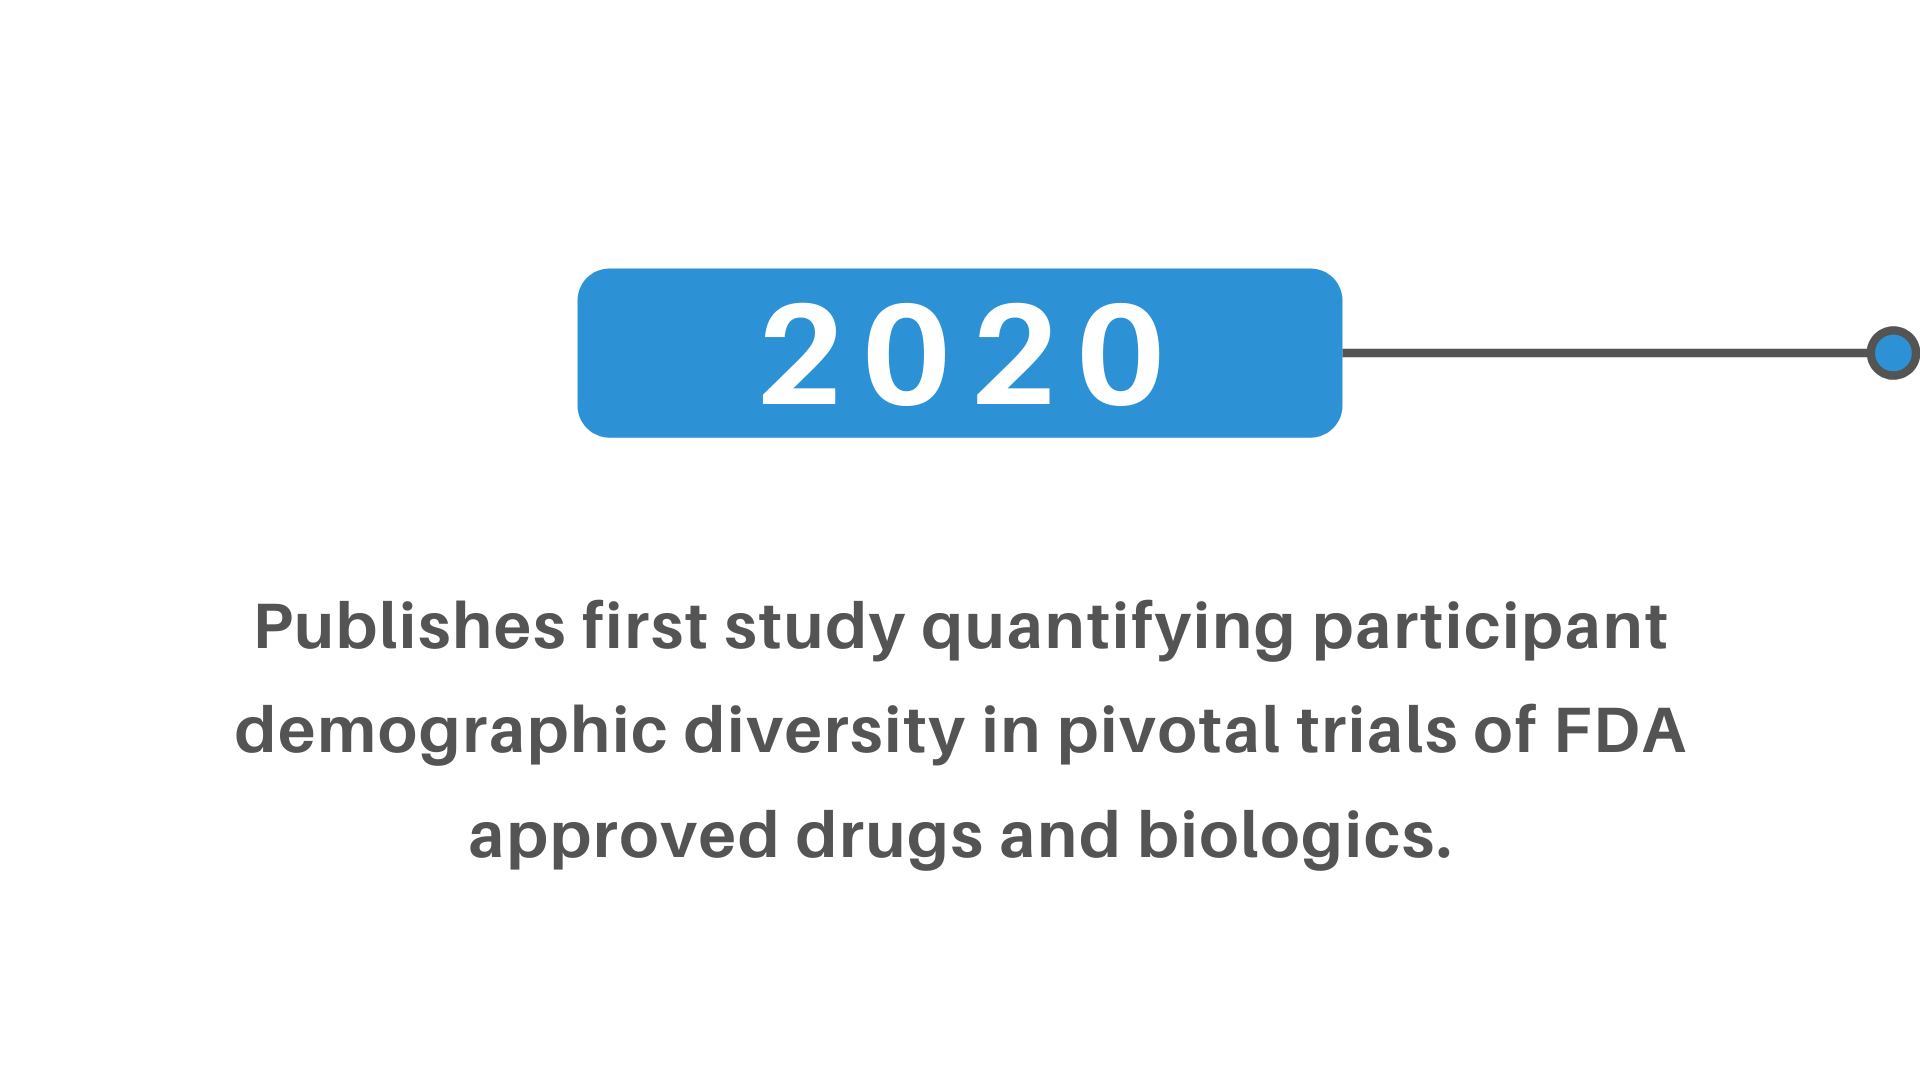 participant demographic diversityp ivotal+trials+FDA+approved+drugs+biologics